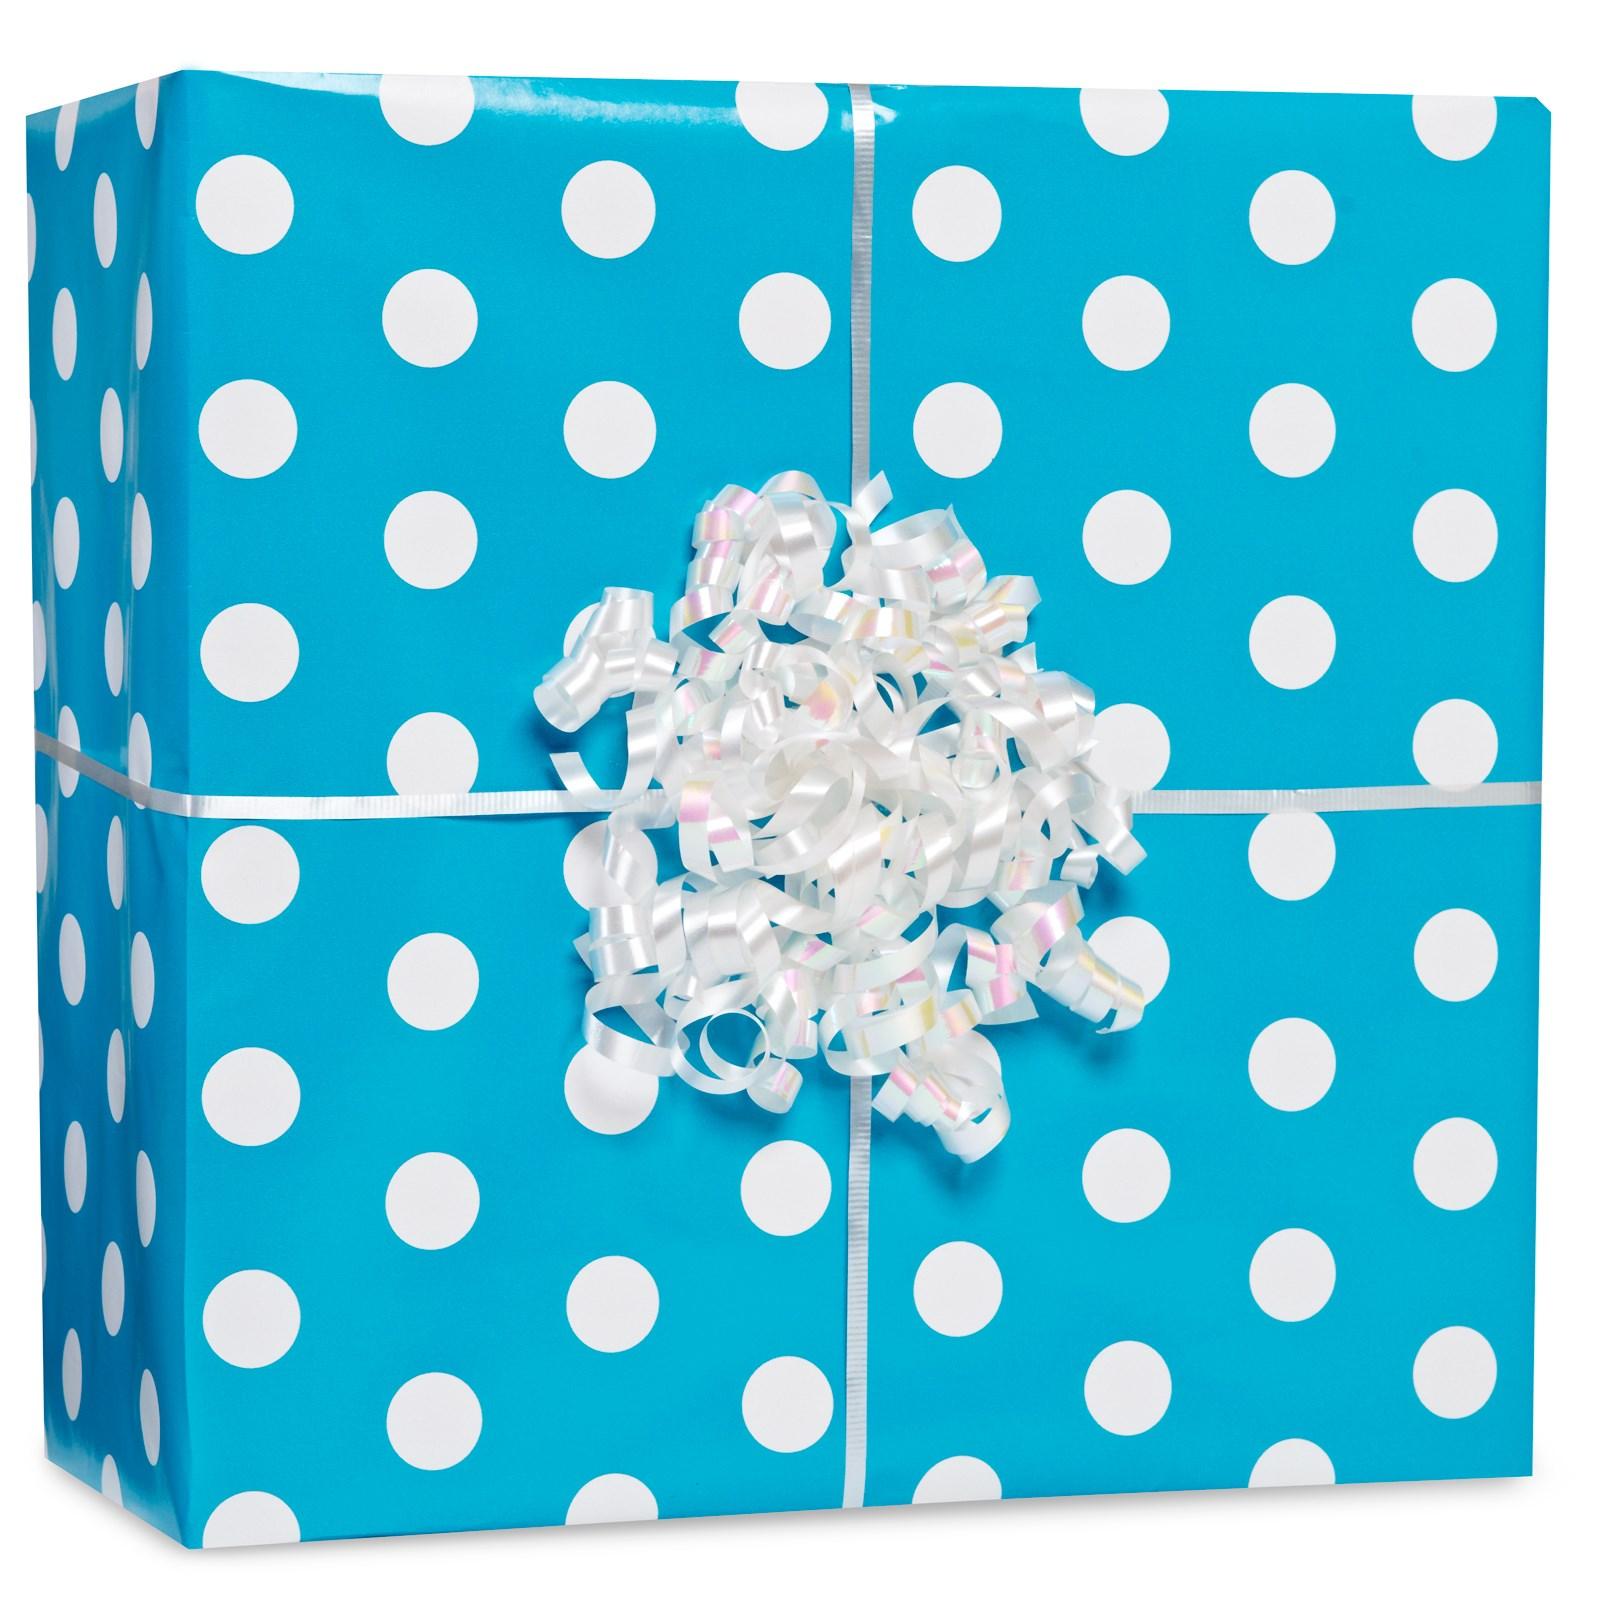 Image of Caribbean Blue Polka Dot Gift Wrap Kit